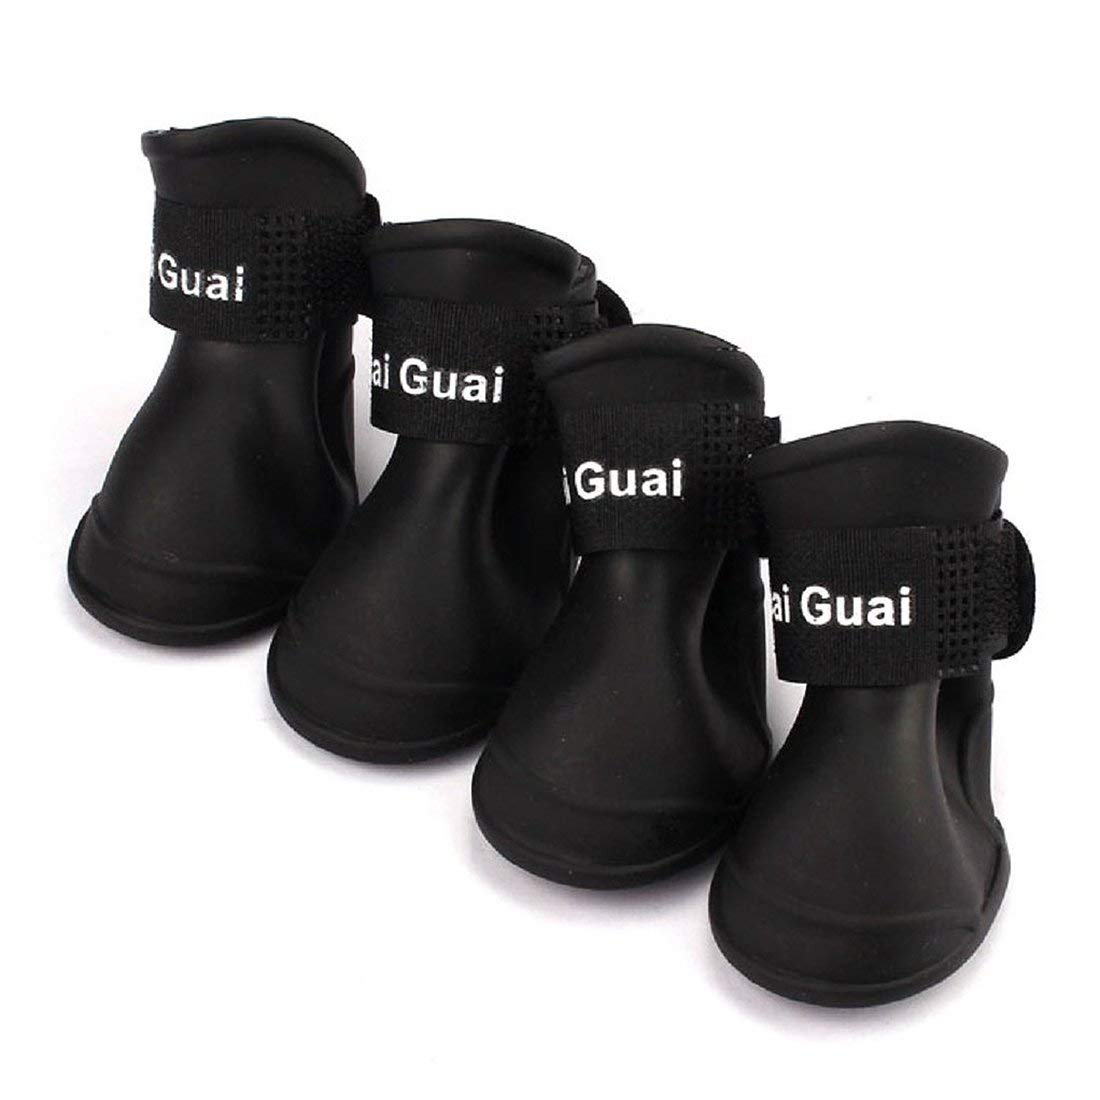 TOOGOO(R) 4 pieces Dog Rain Boots Waterproof Shoes Accessories Pet Dog Medium Size (Black, L)